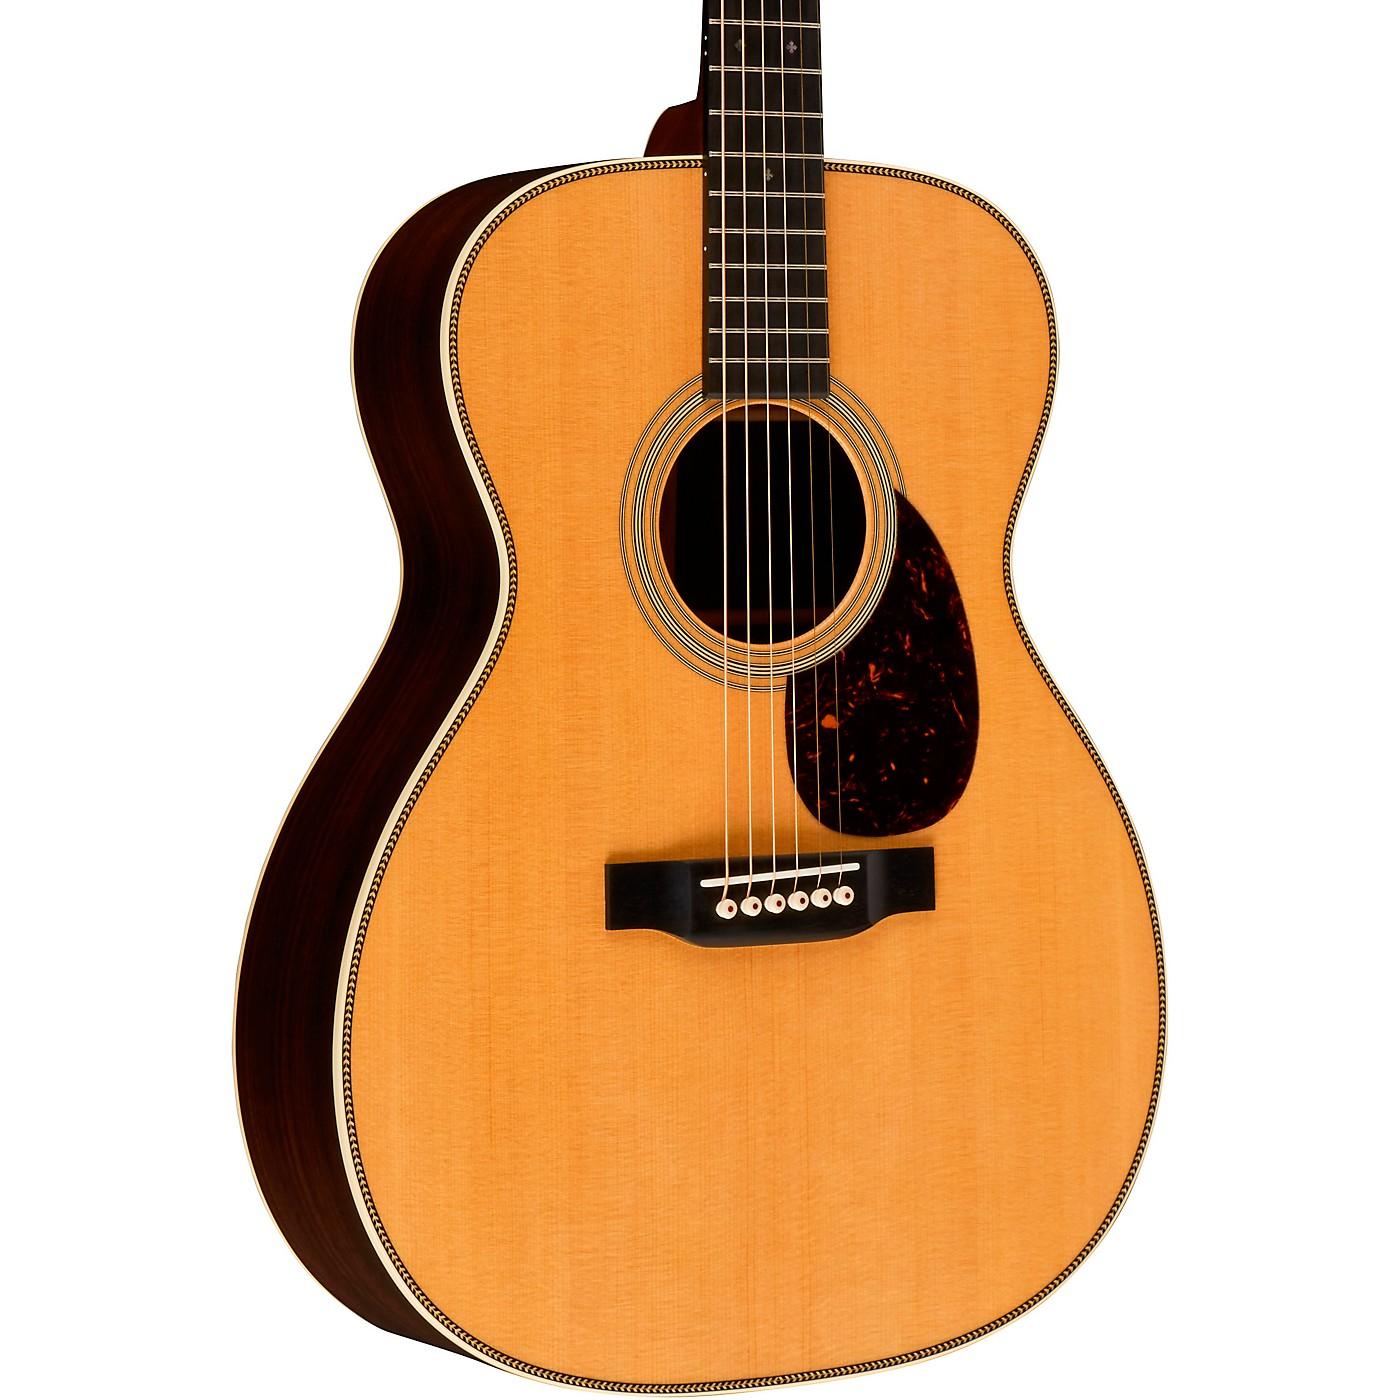 Martin OM-28 Standard Orchestra Model Acoustic Guitar thumbnail